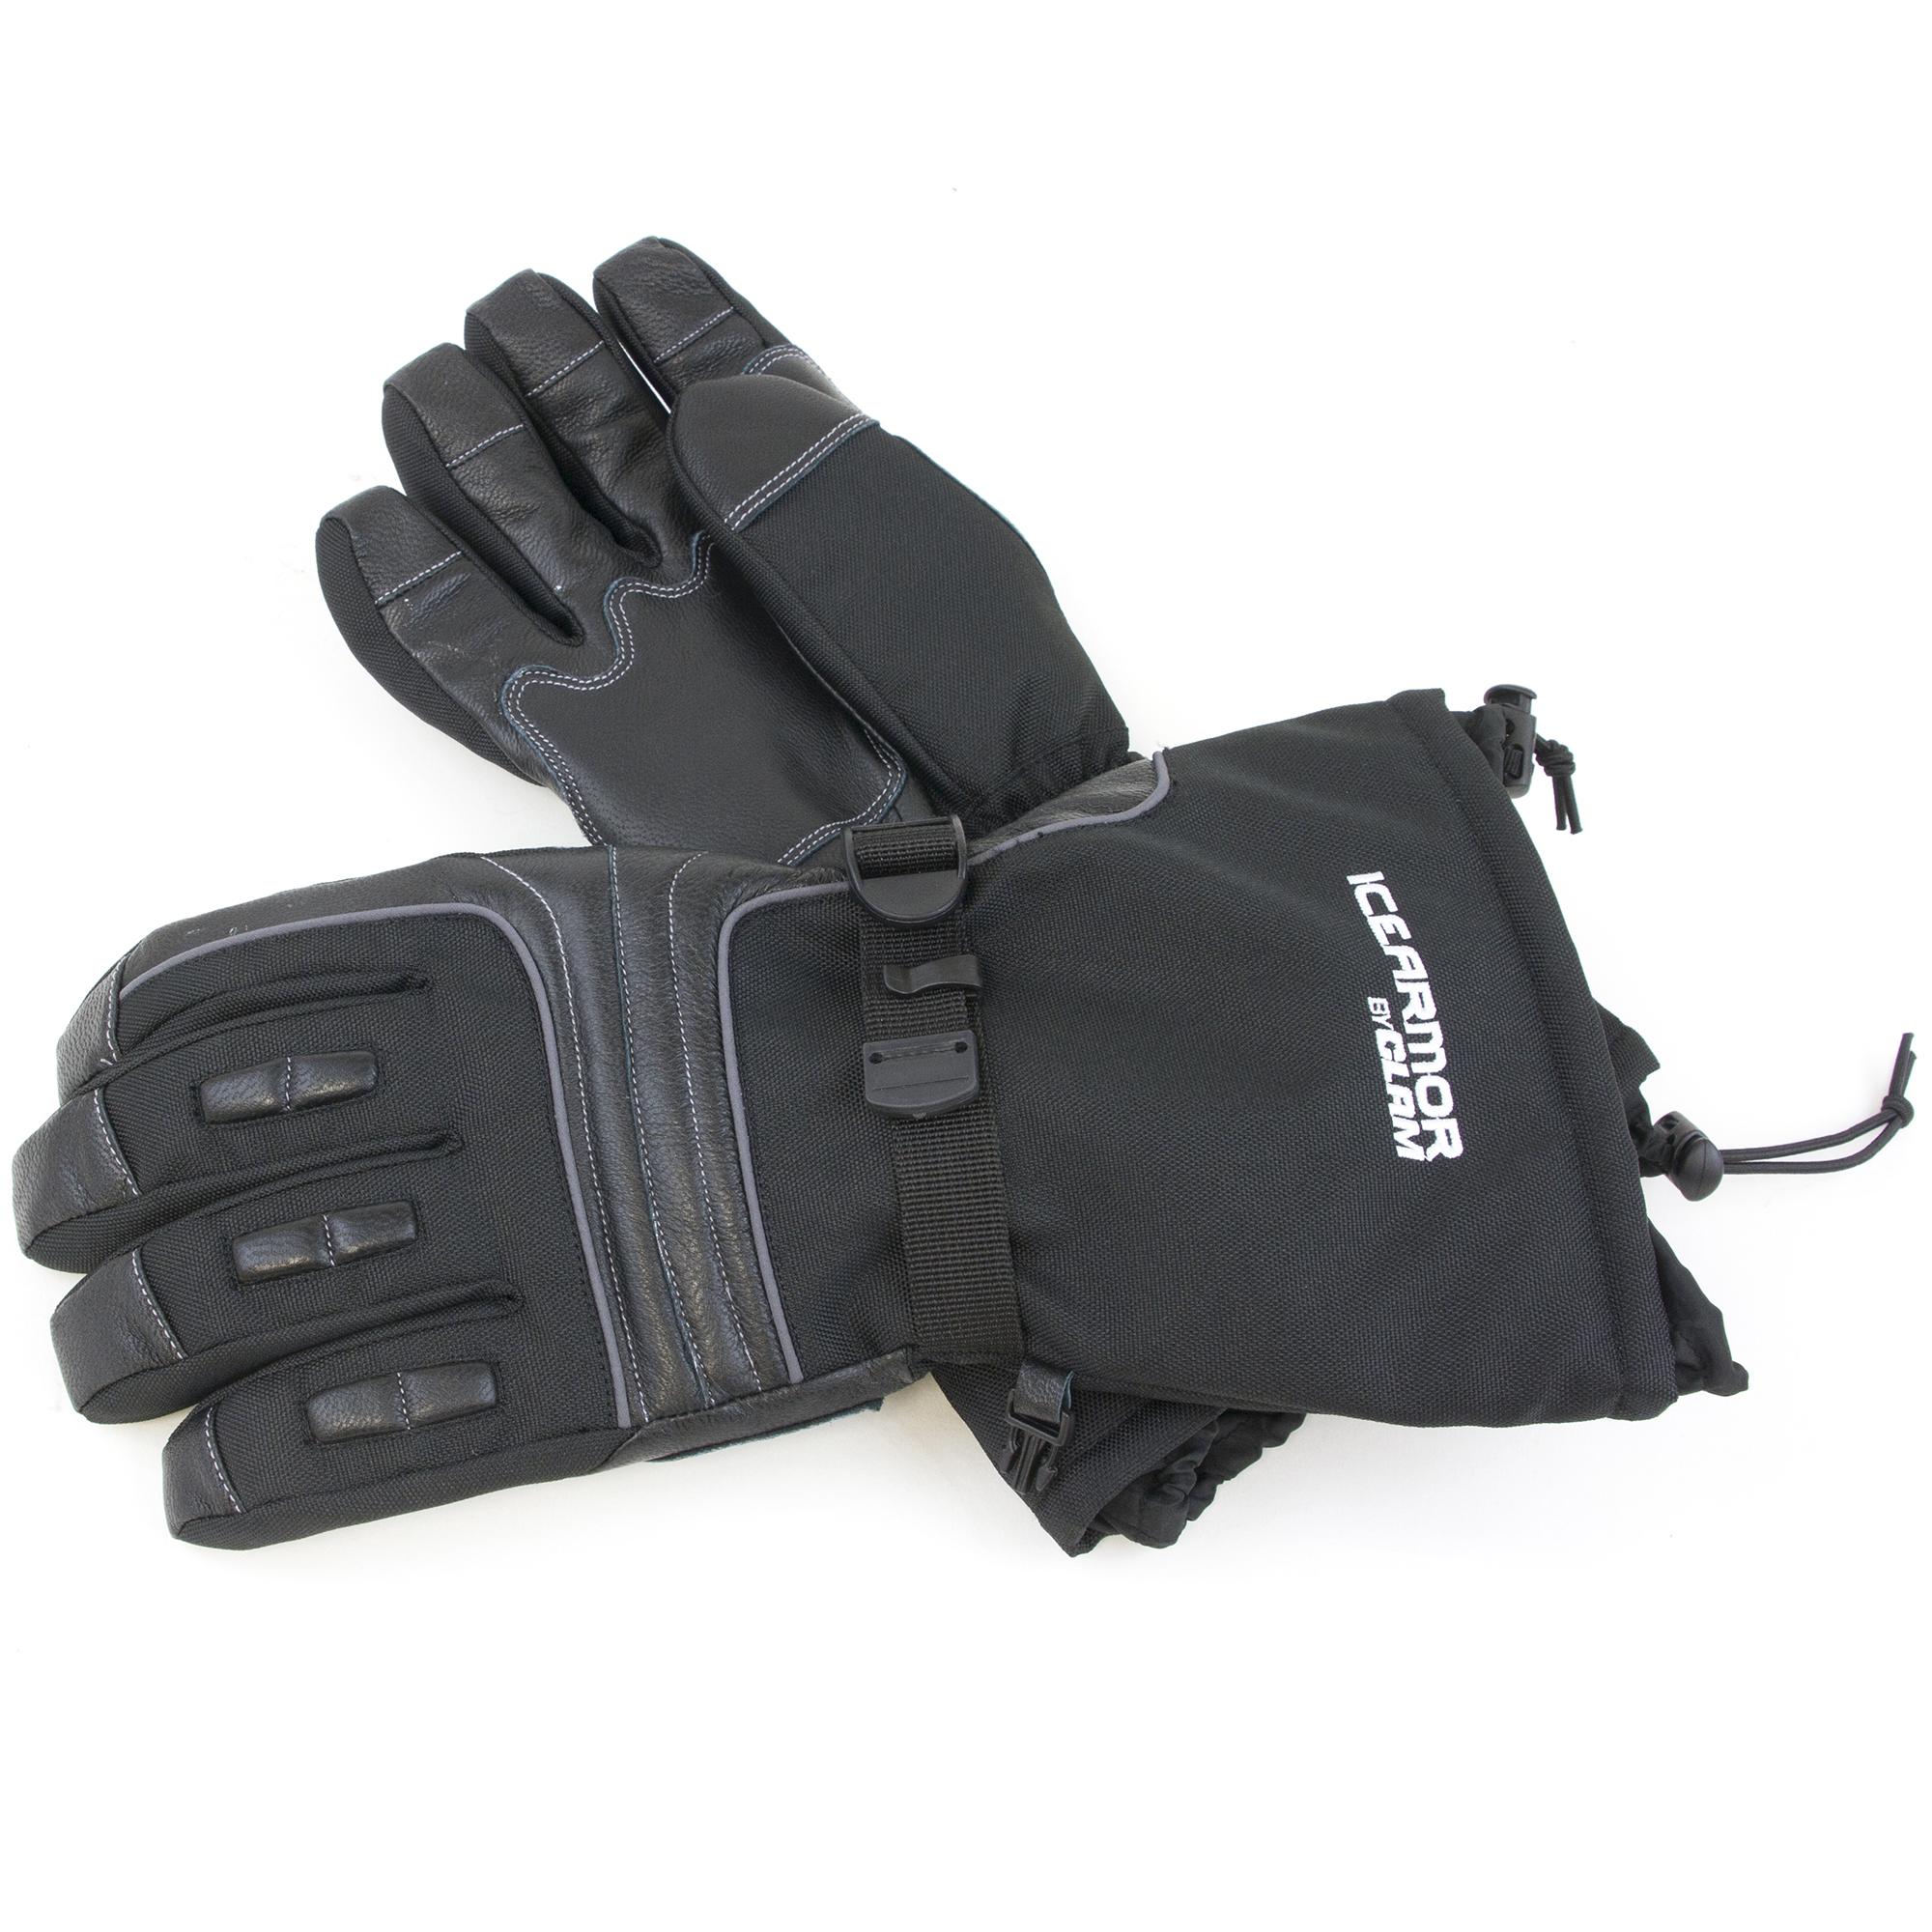 Clam Men's Ice Armor Renegade Glove